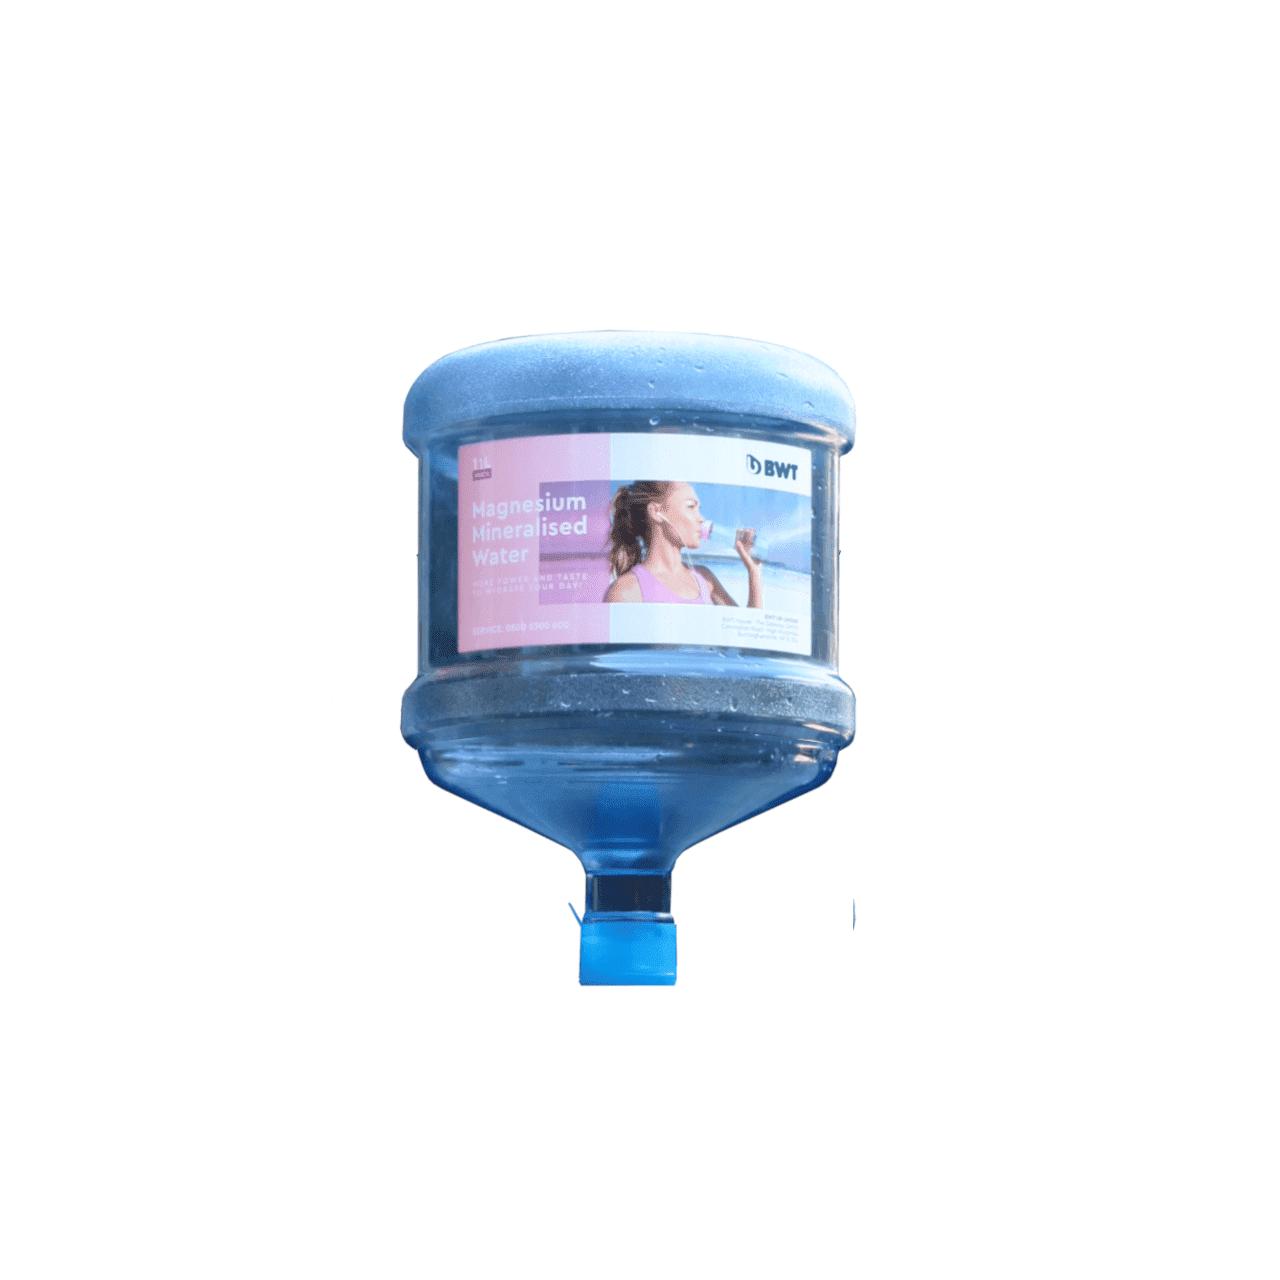 BWT water cooler